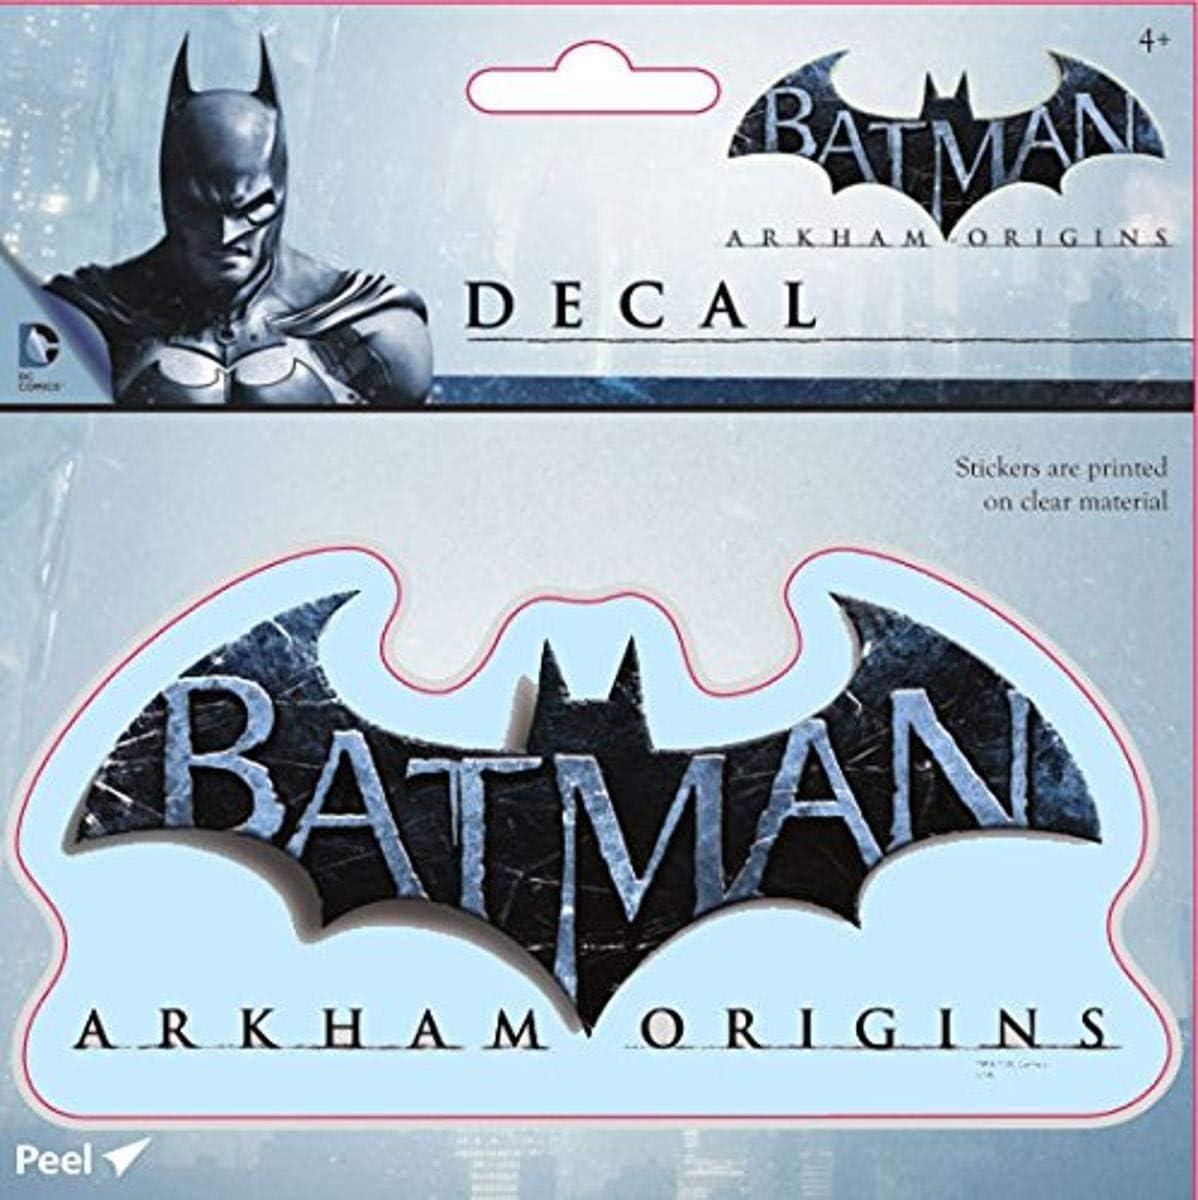 DC Funko Pop Batman Vinyl Decal Truck Car Sticker Laptop